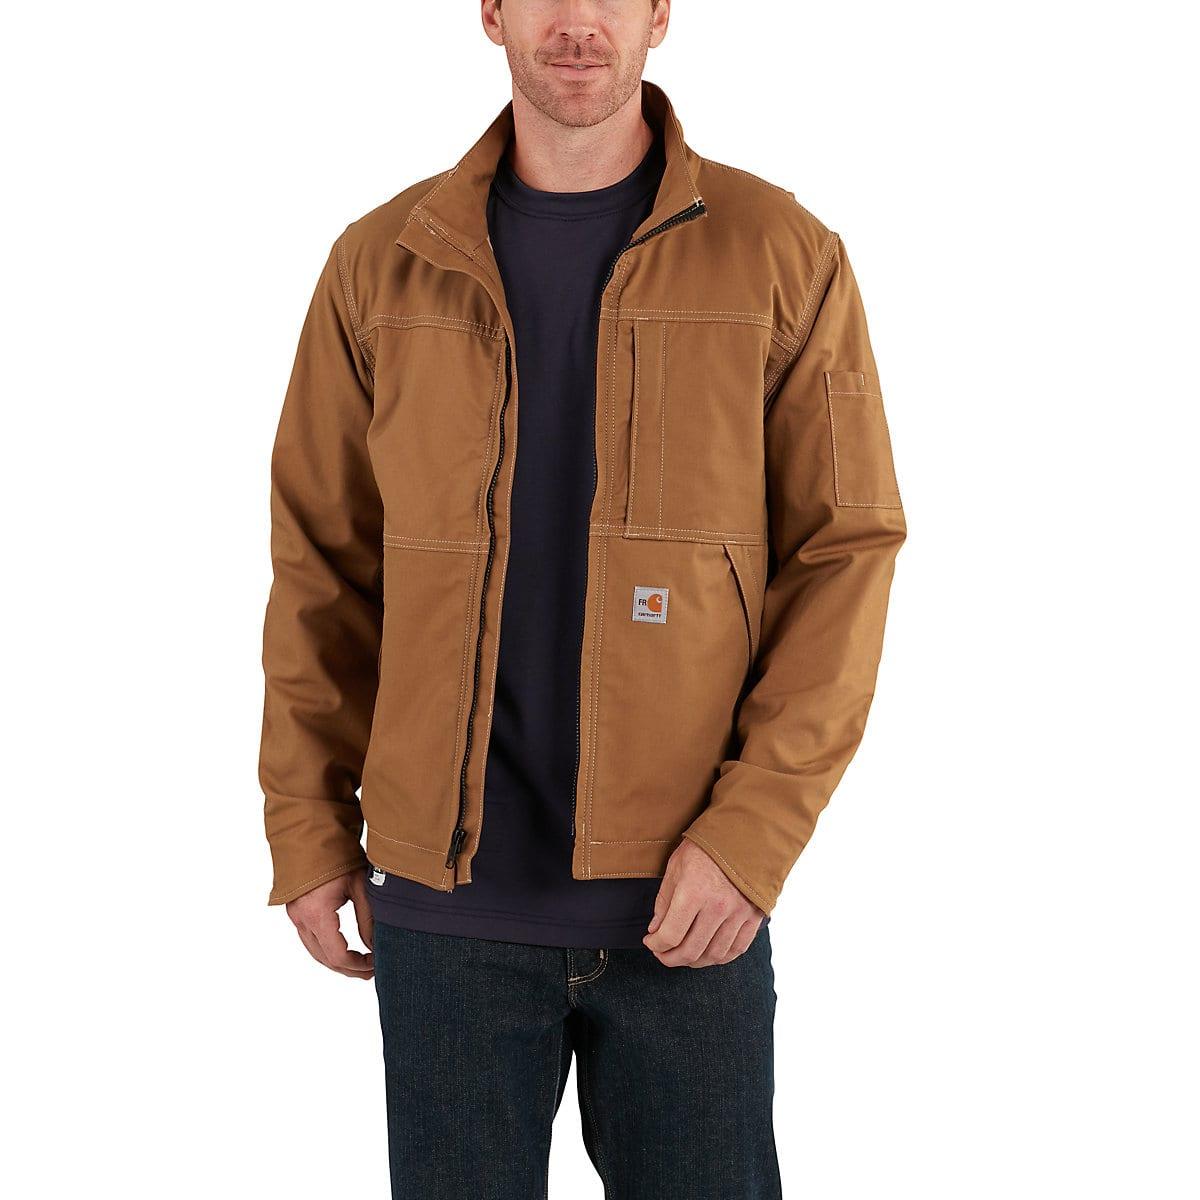 99451c8f3b357 Men's Full Swing® Quick Duck® Flame-Resistant Jacket | Carhartt